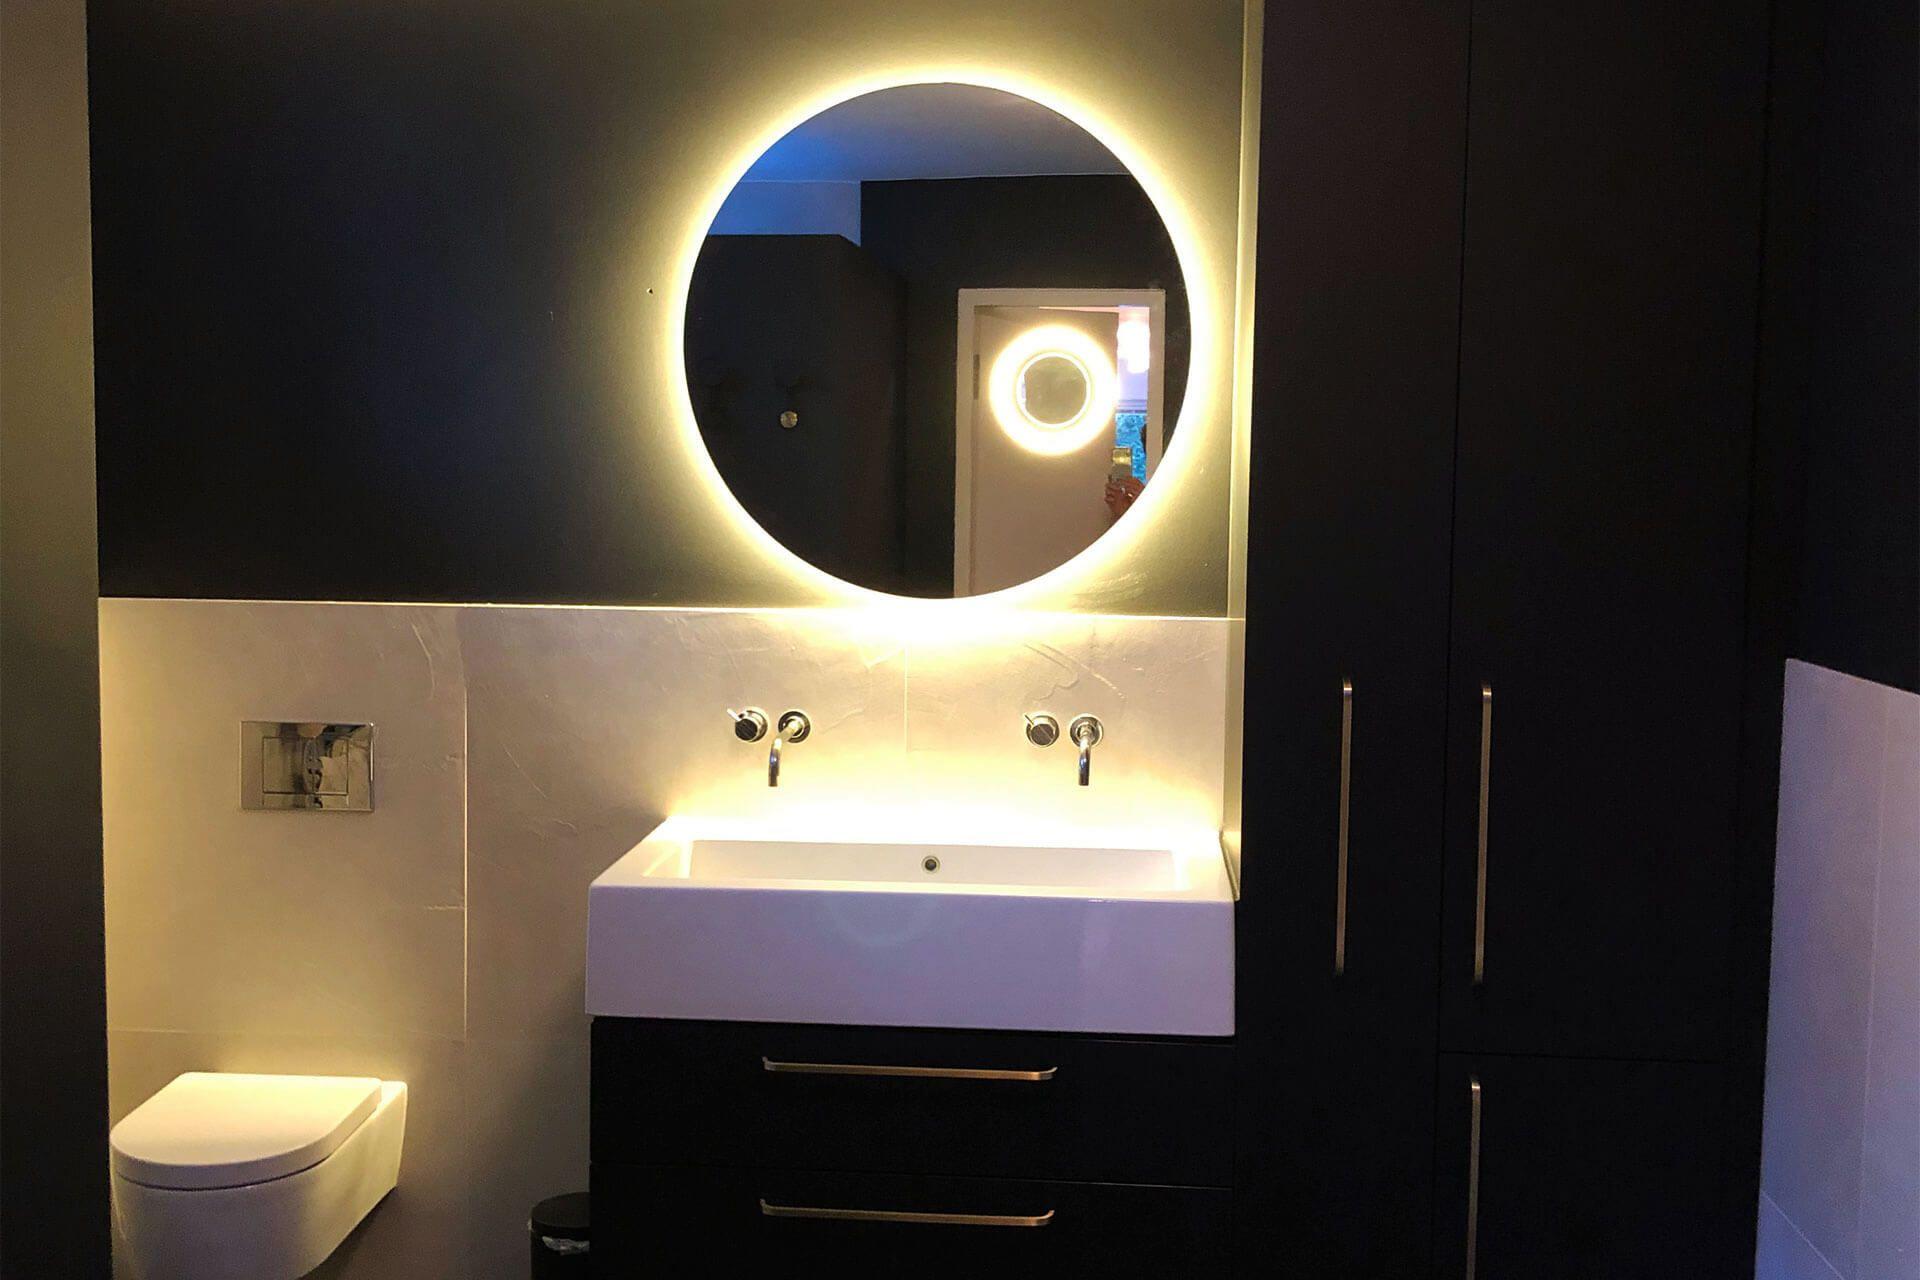 Https Spiegelshop24 Com Info Referenzen Html Badspiegel Badezimmerspiegel Beleuchtung Badezimmerspiegel